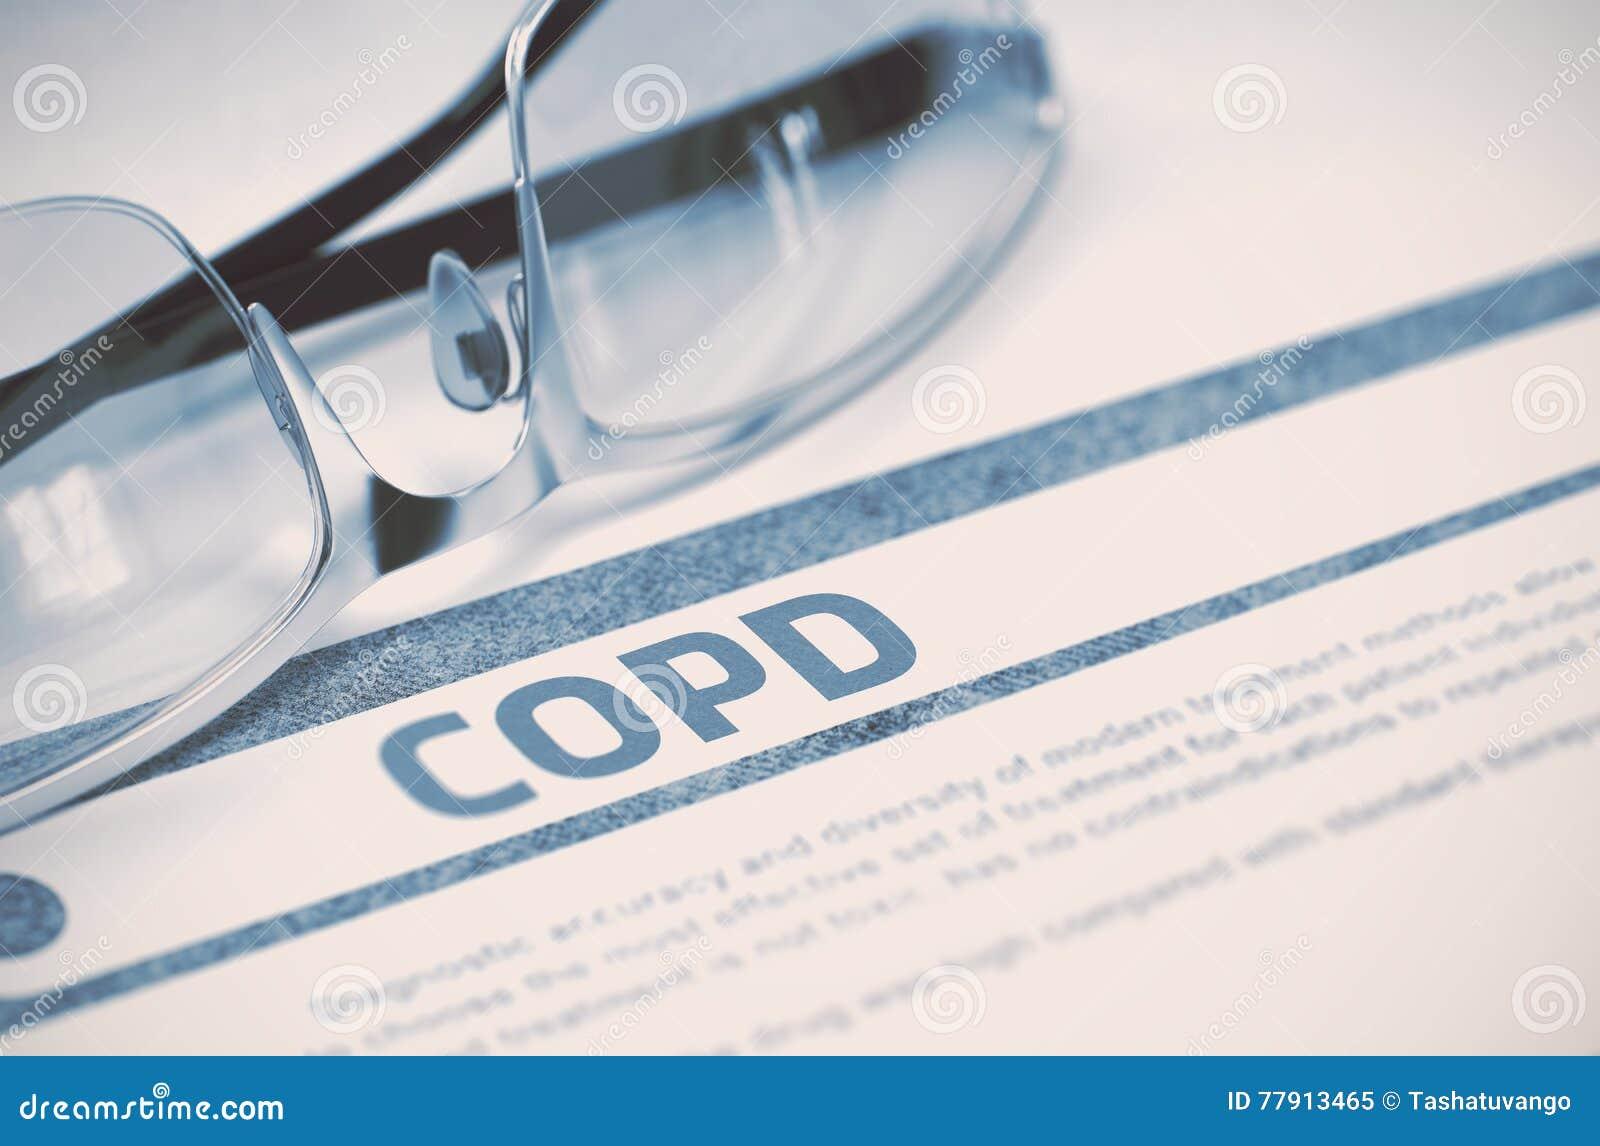 COPD - Printed Diagnosis. Medicine Concept. 3D Illustration.